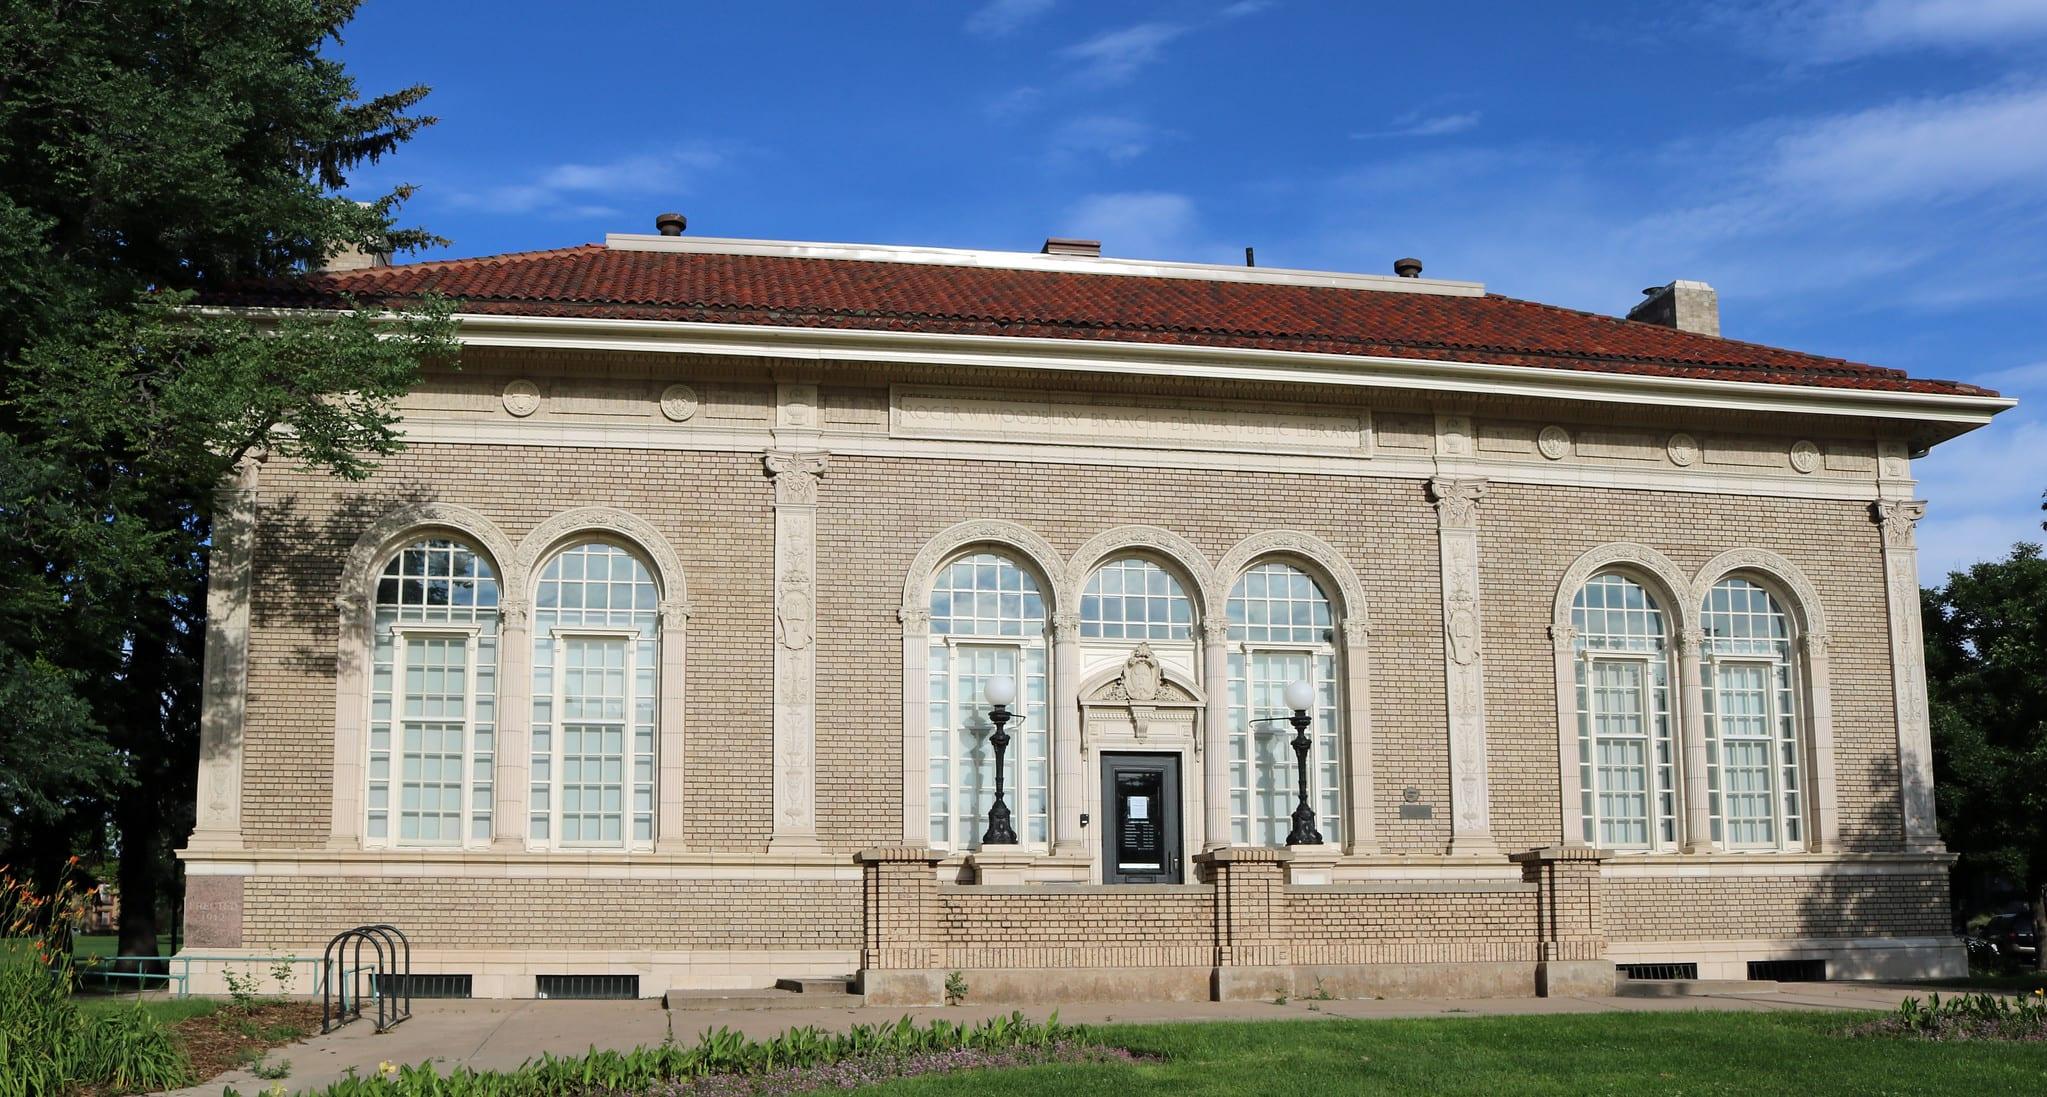 image of woodbury library